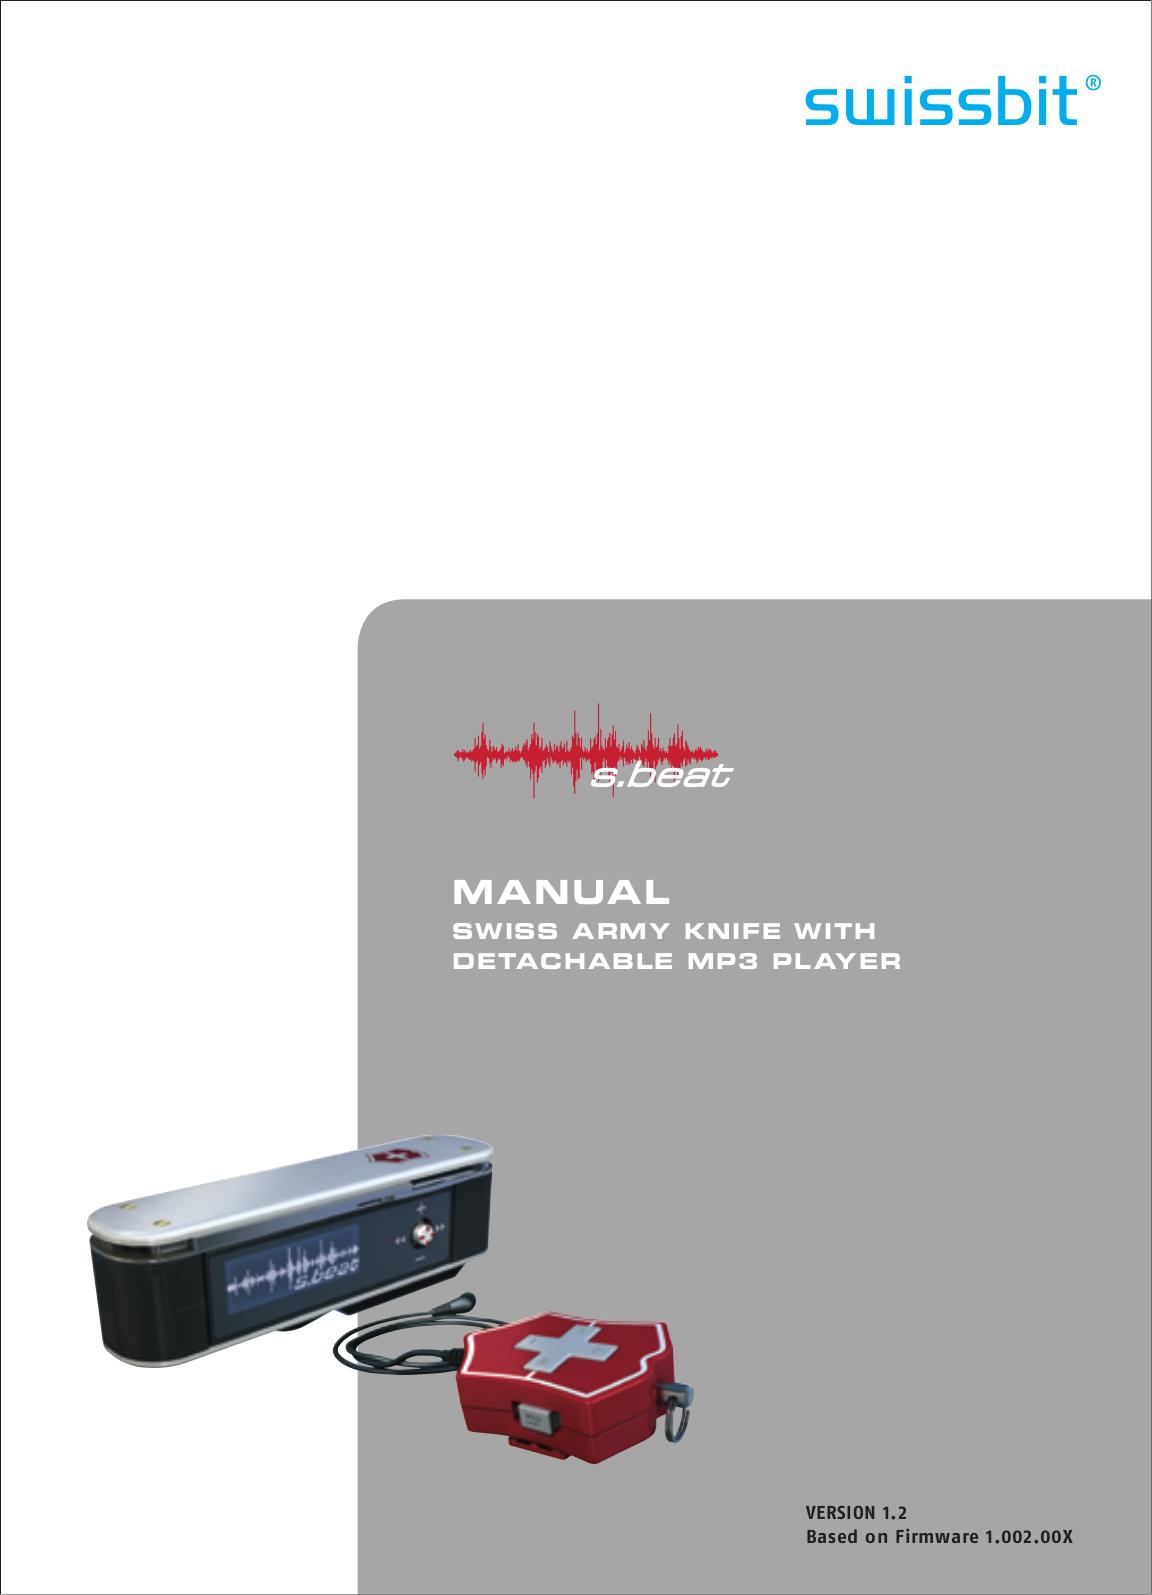 pdf for Victorinox Storage SwissMemory SwissMemory 1GB manual